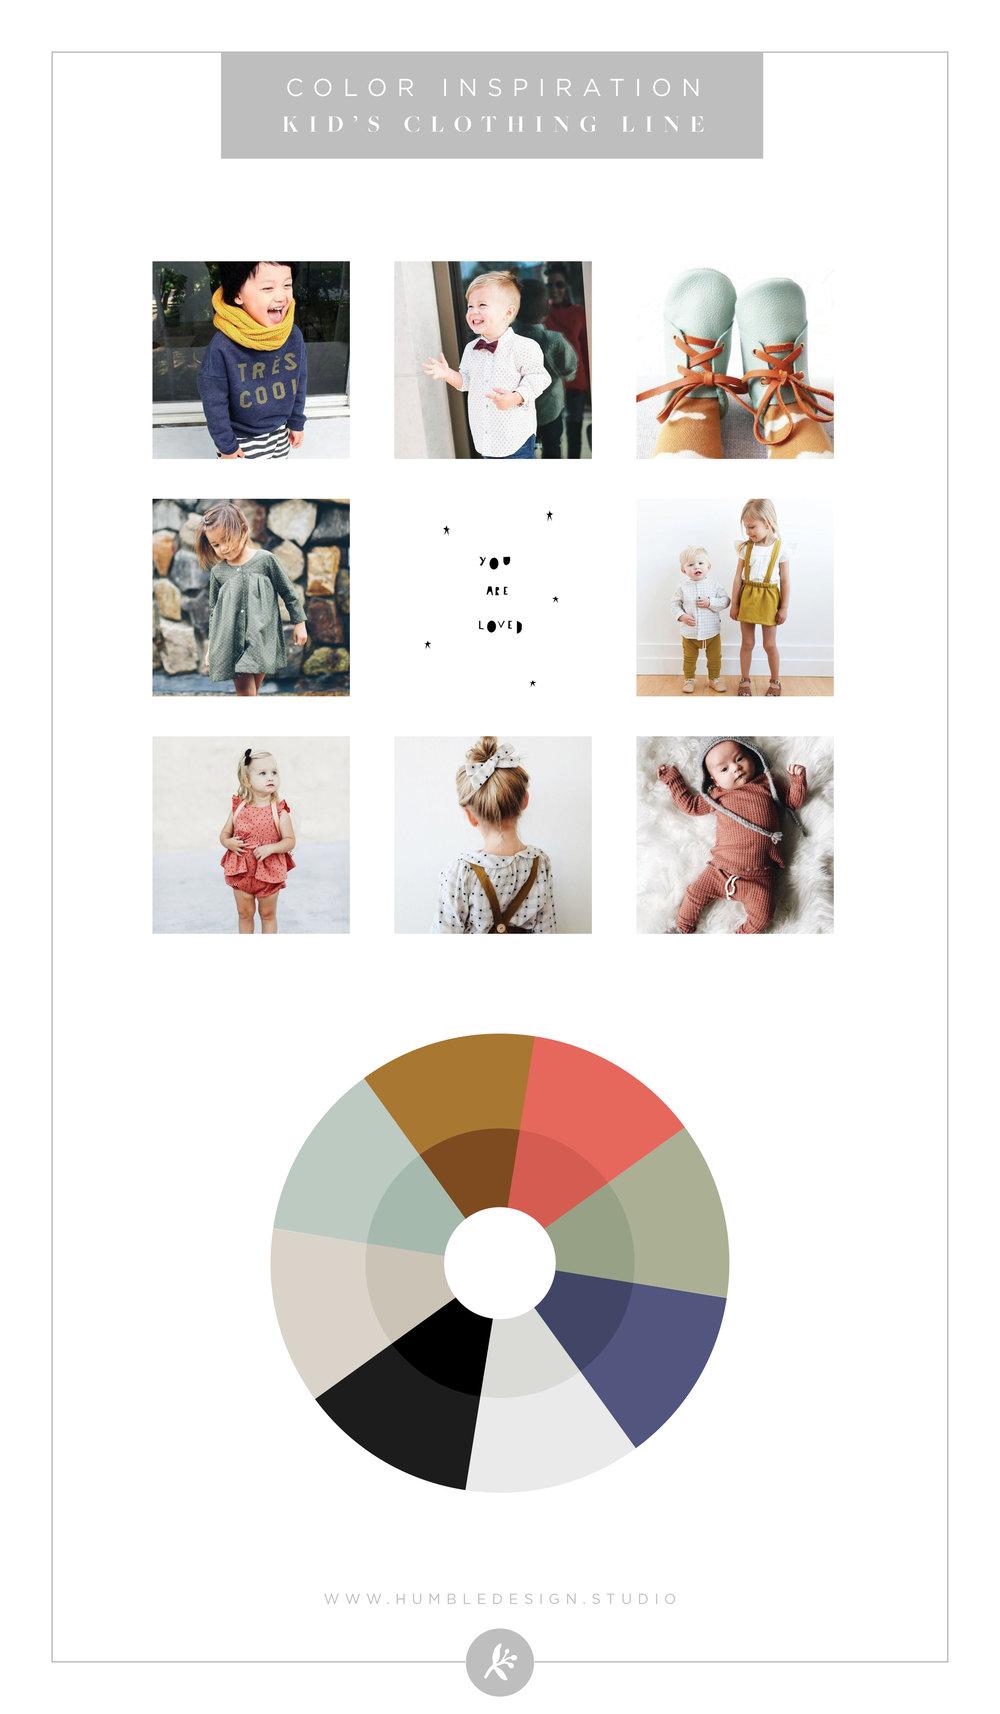 Kids clothing line color palette inspiration